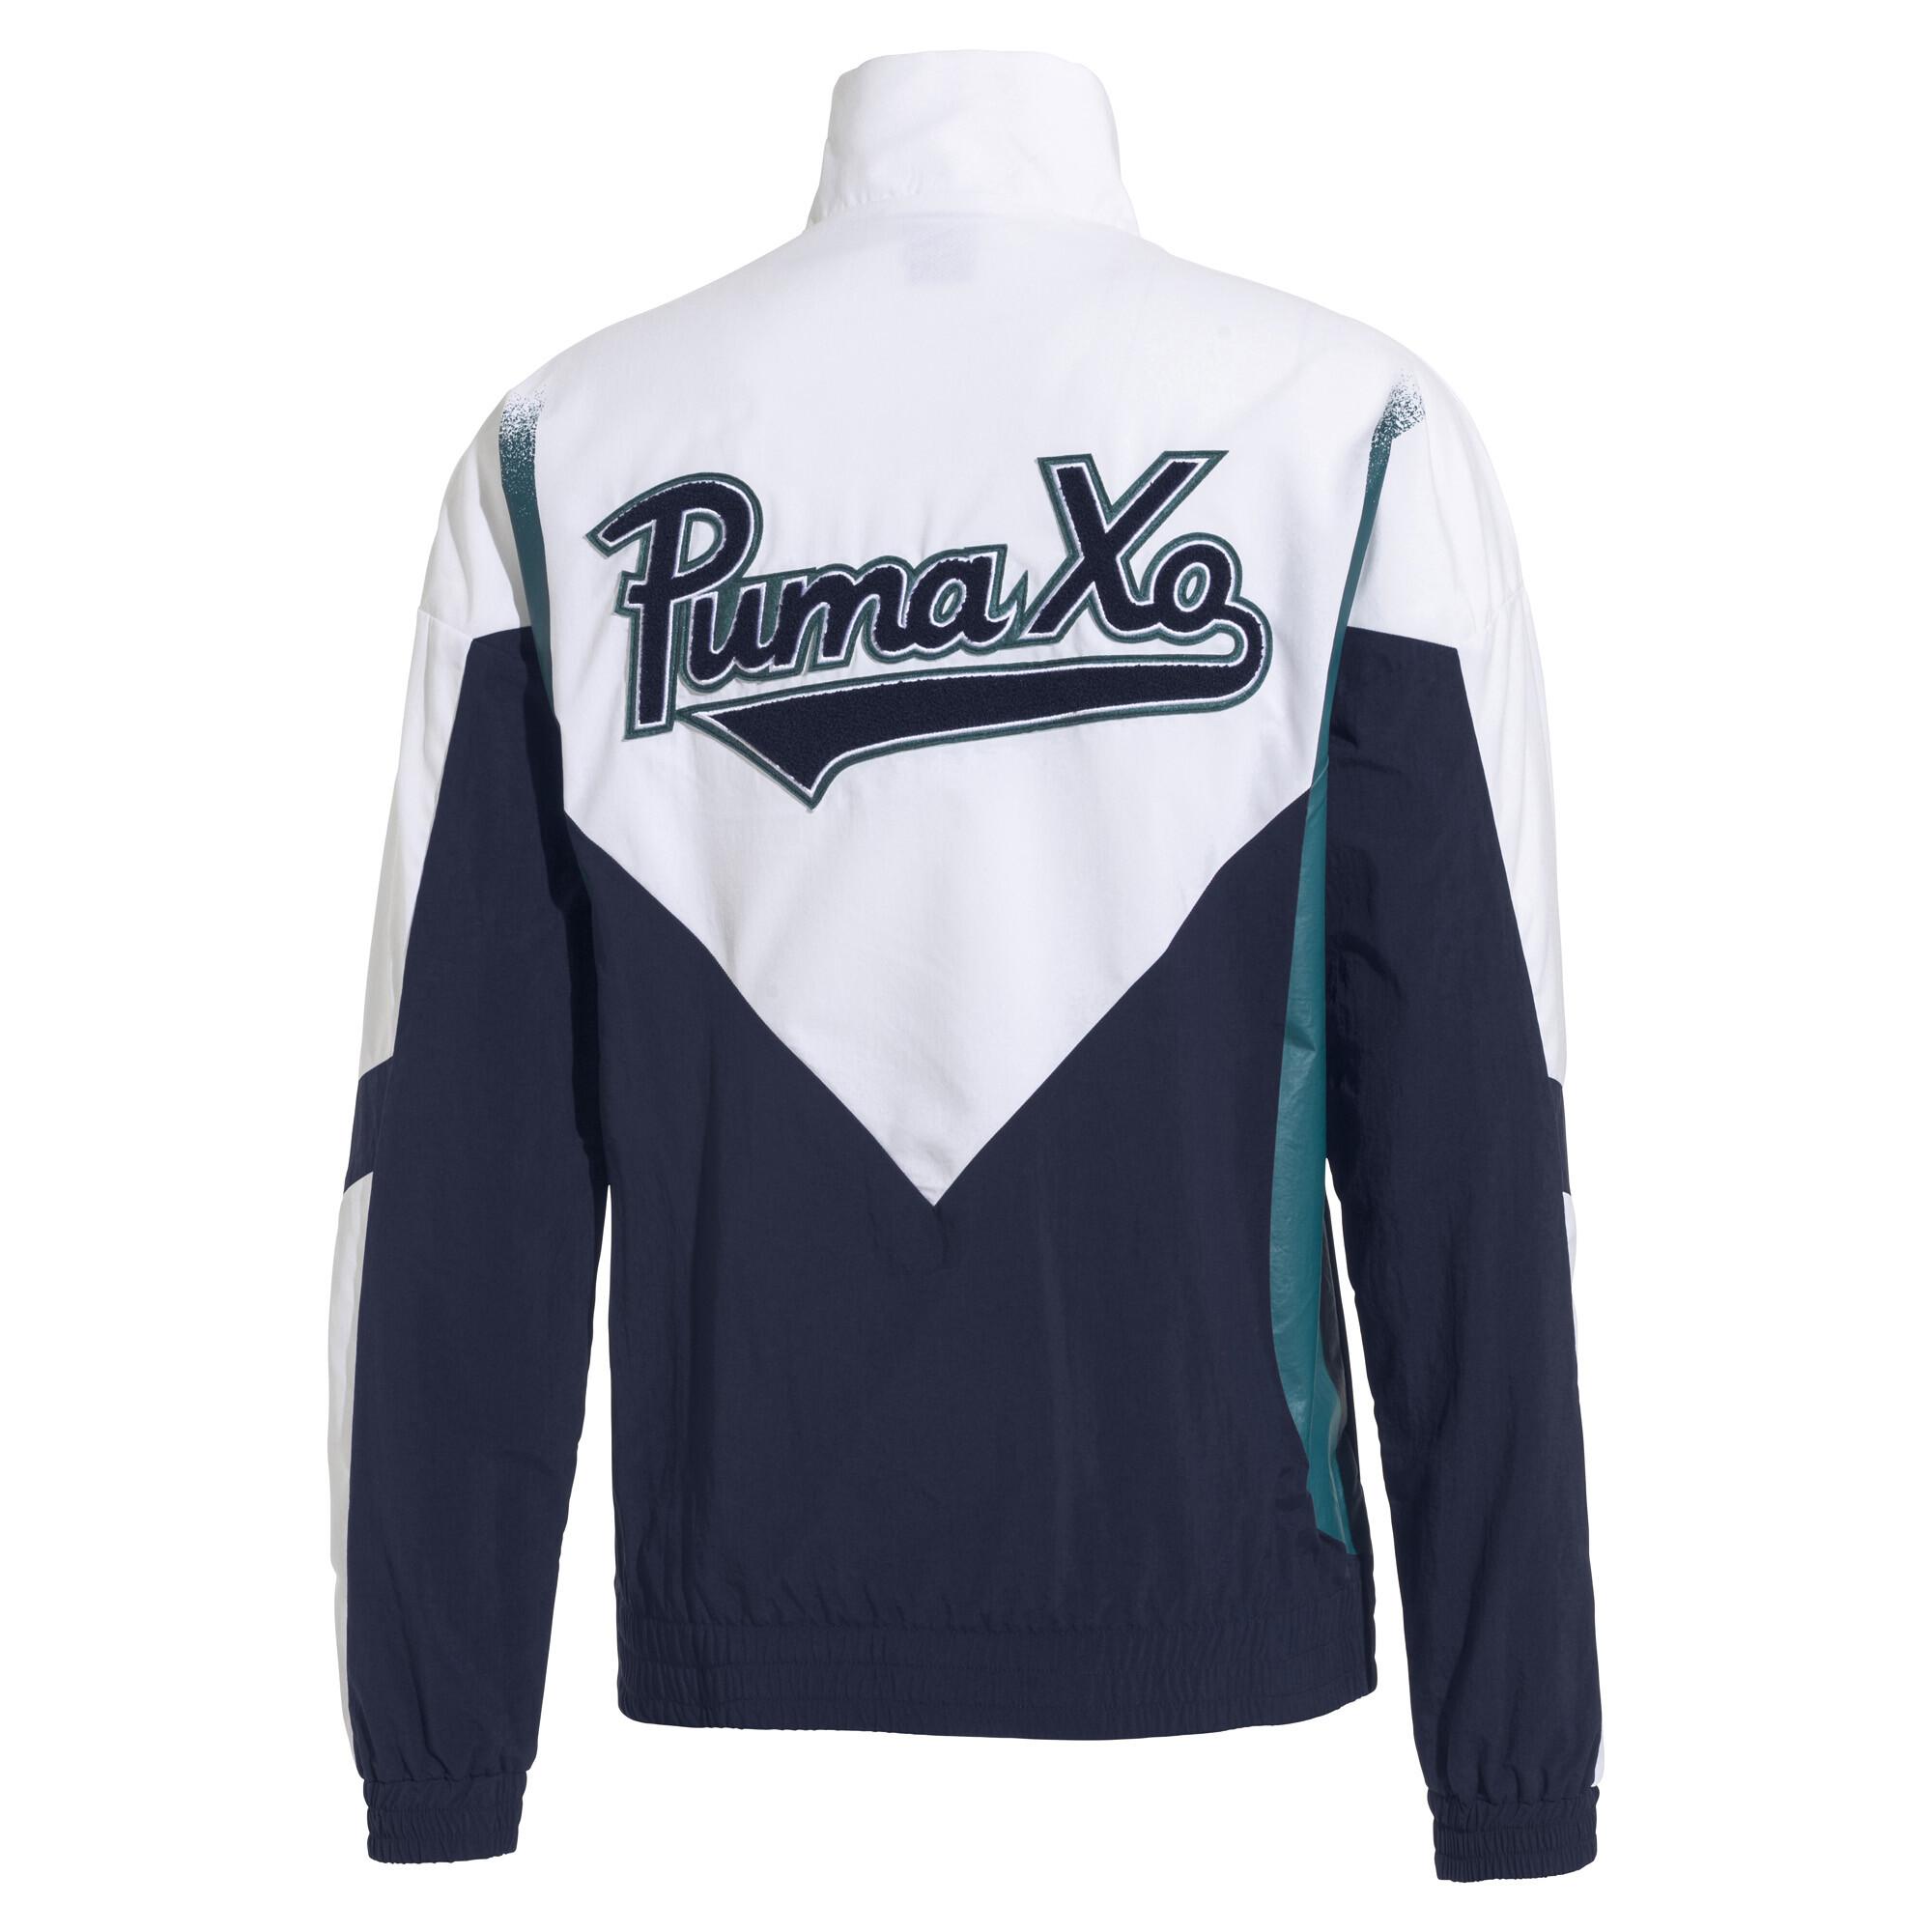 Image Puma PUMA x XO Homage to Archive Track Jacket #2